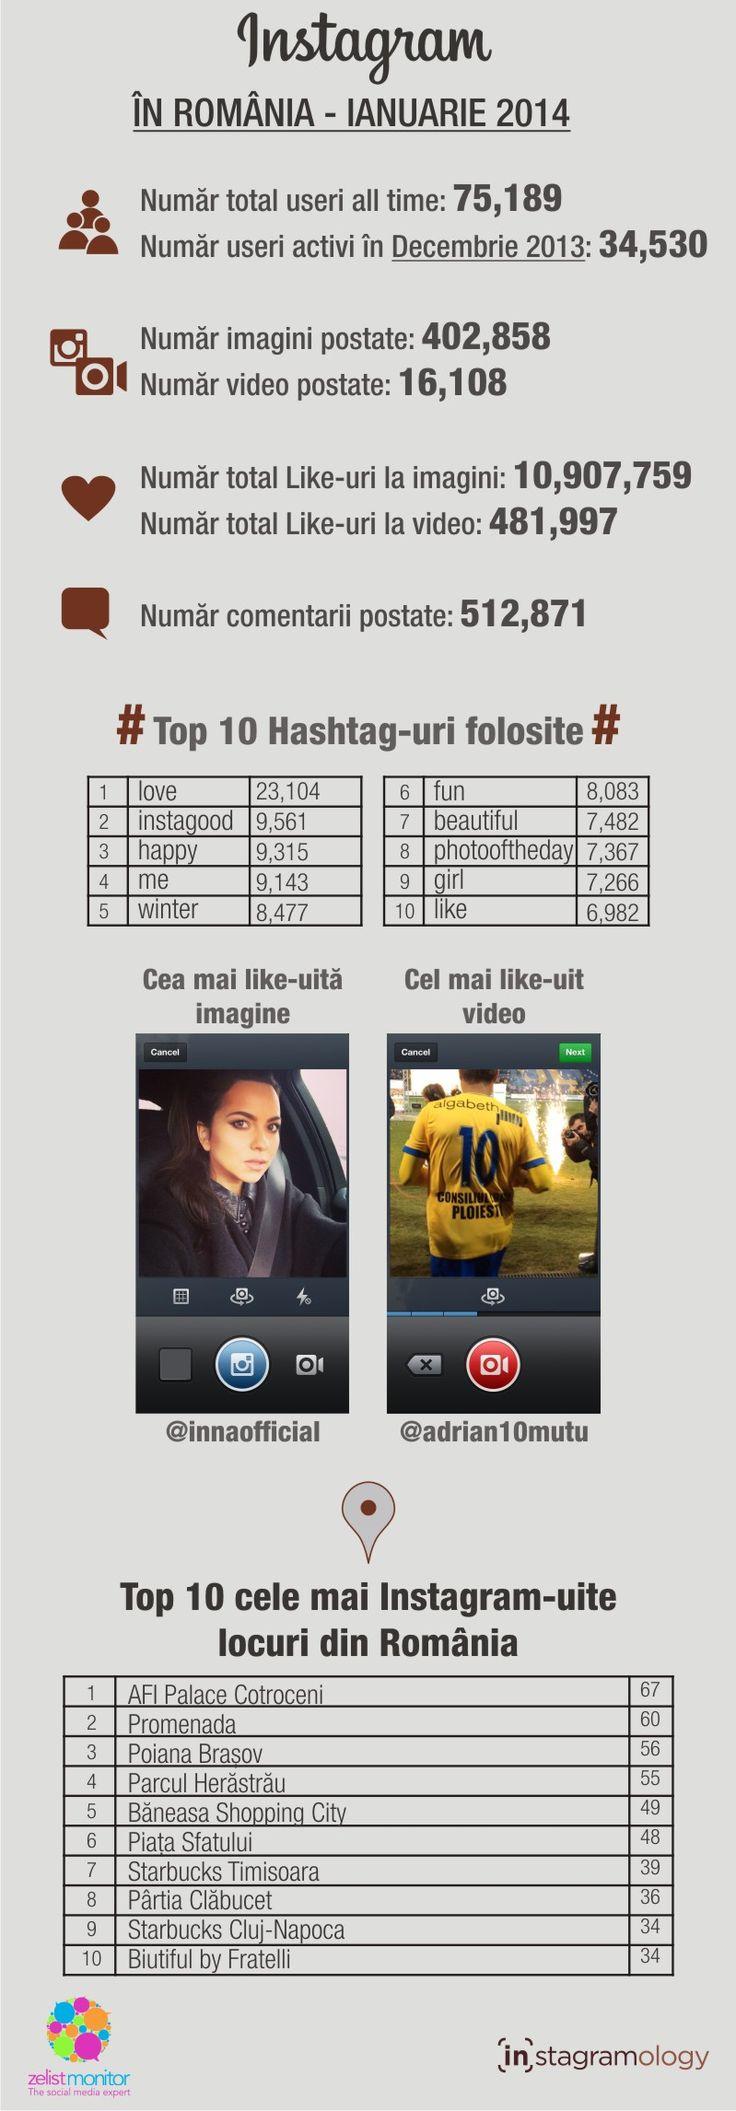 Statistici Instagram in Romania - ianuarie 2014